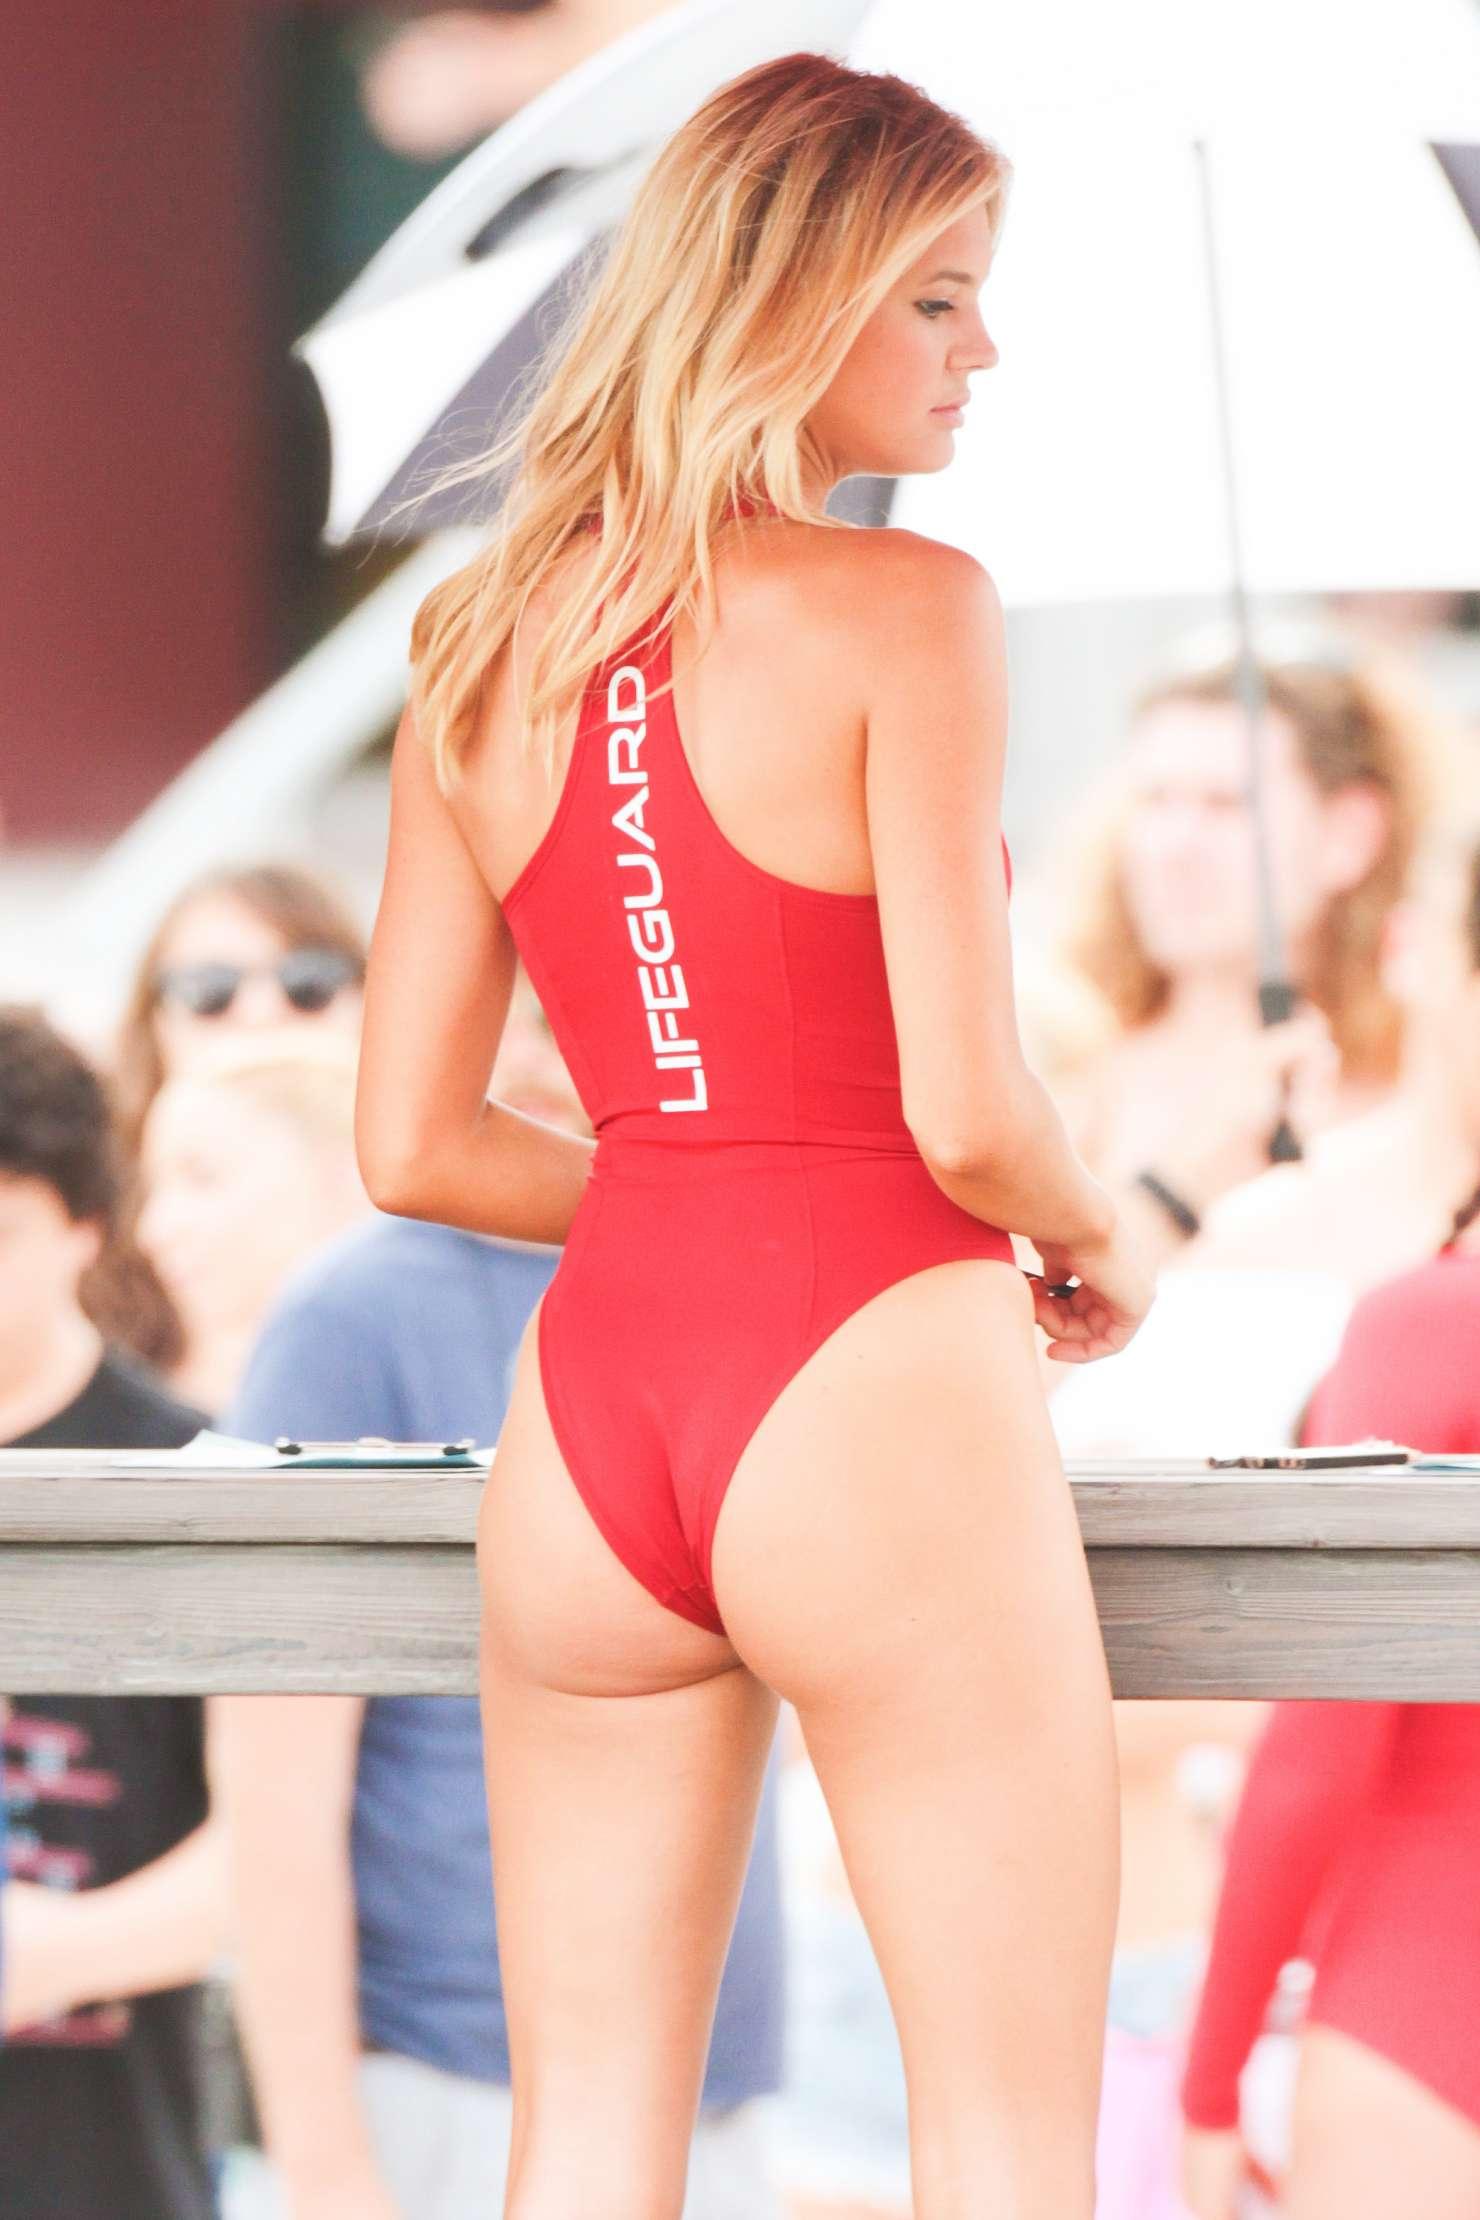 Alexandra daddario hottest girl - 1 part 2